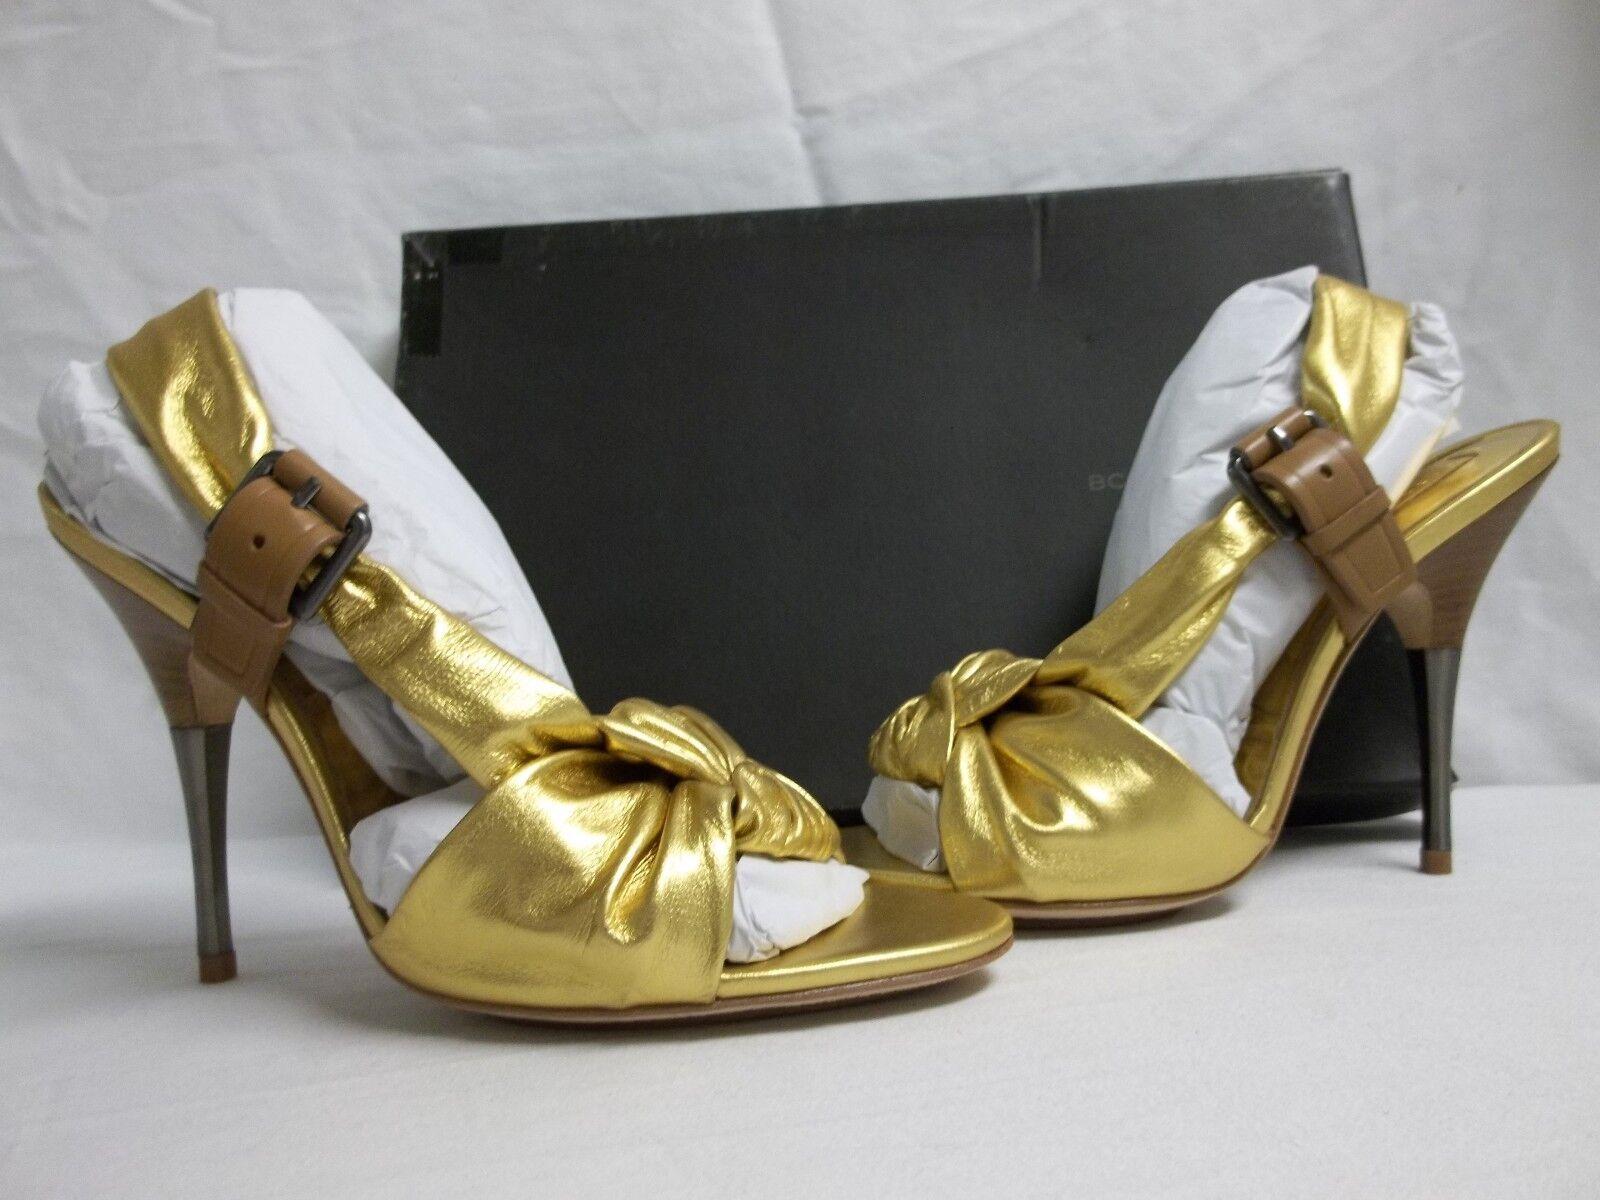 BCBG Max Azria Sz 8 M Chelsey Gold Sand Leder Open Toe Heels NEU Damenschuhe Schuhes